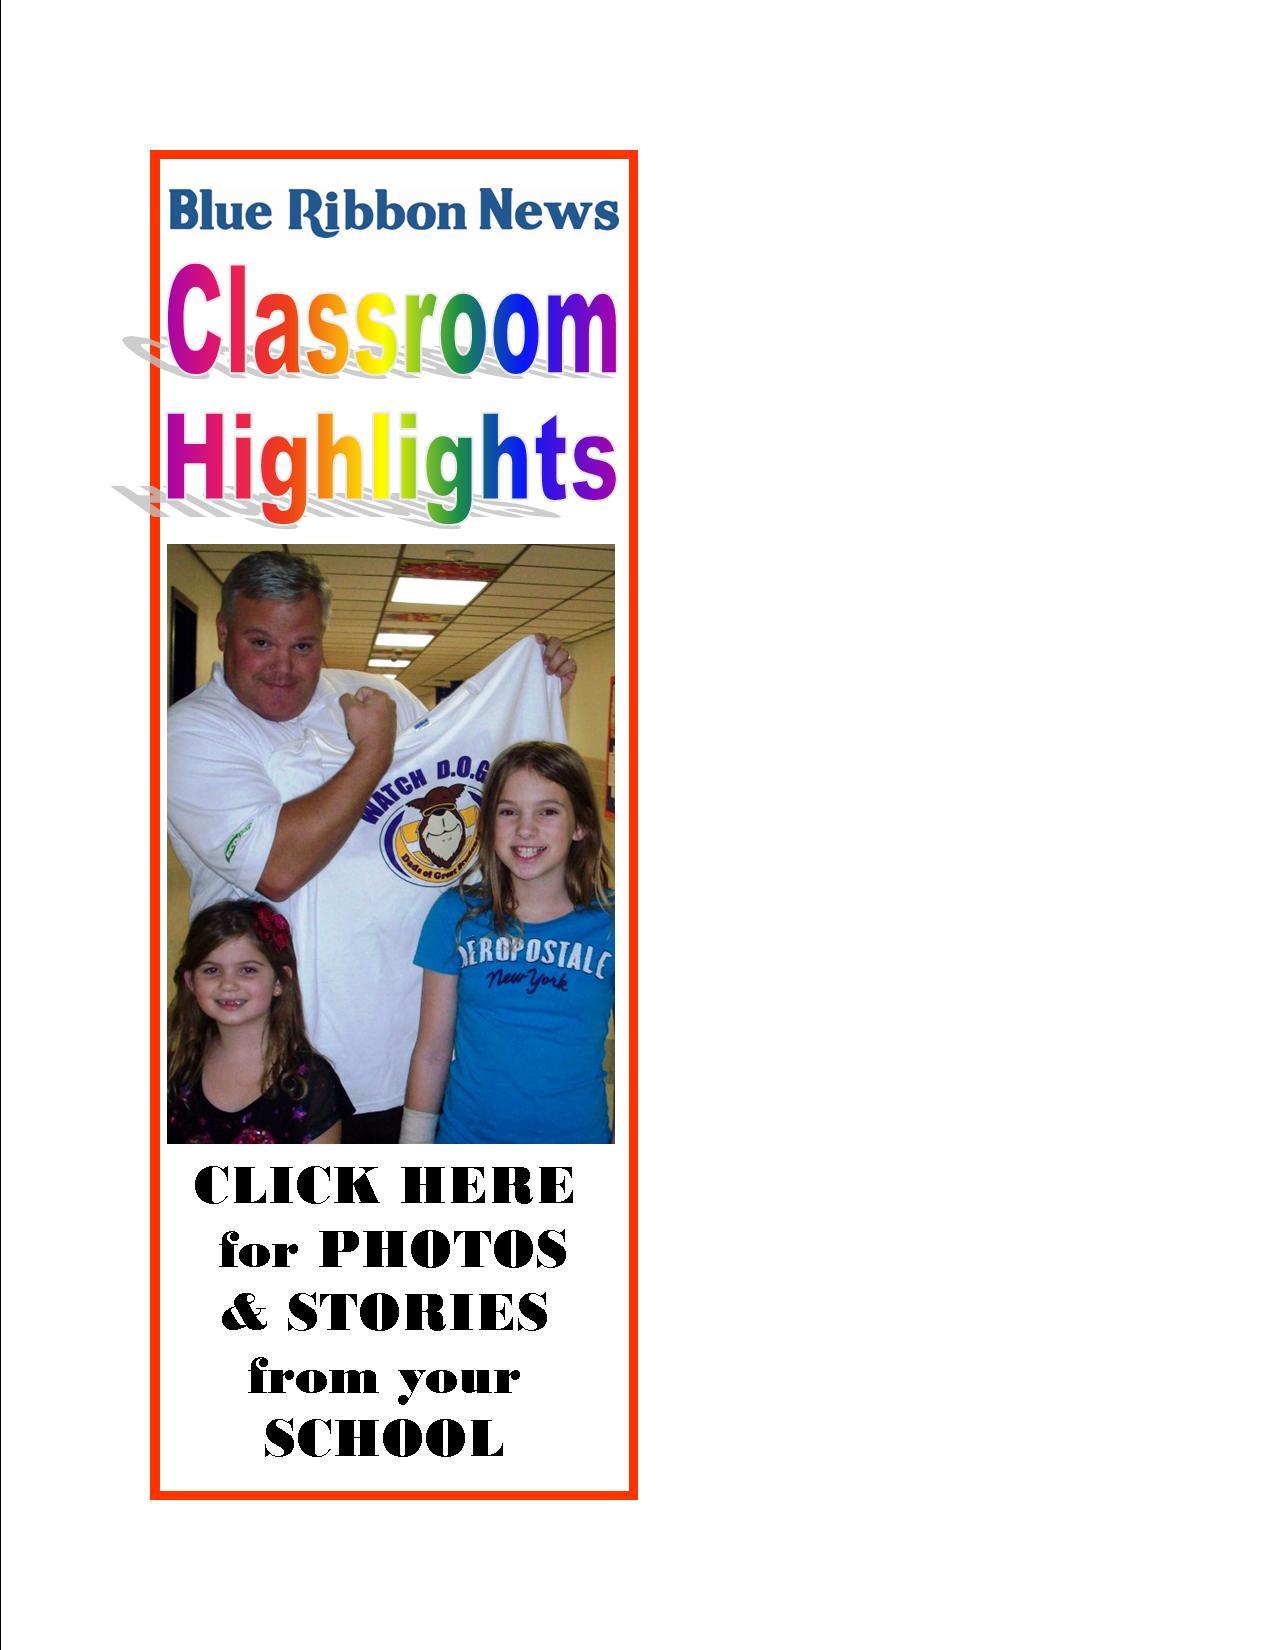 SchoolNews